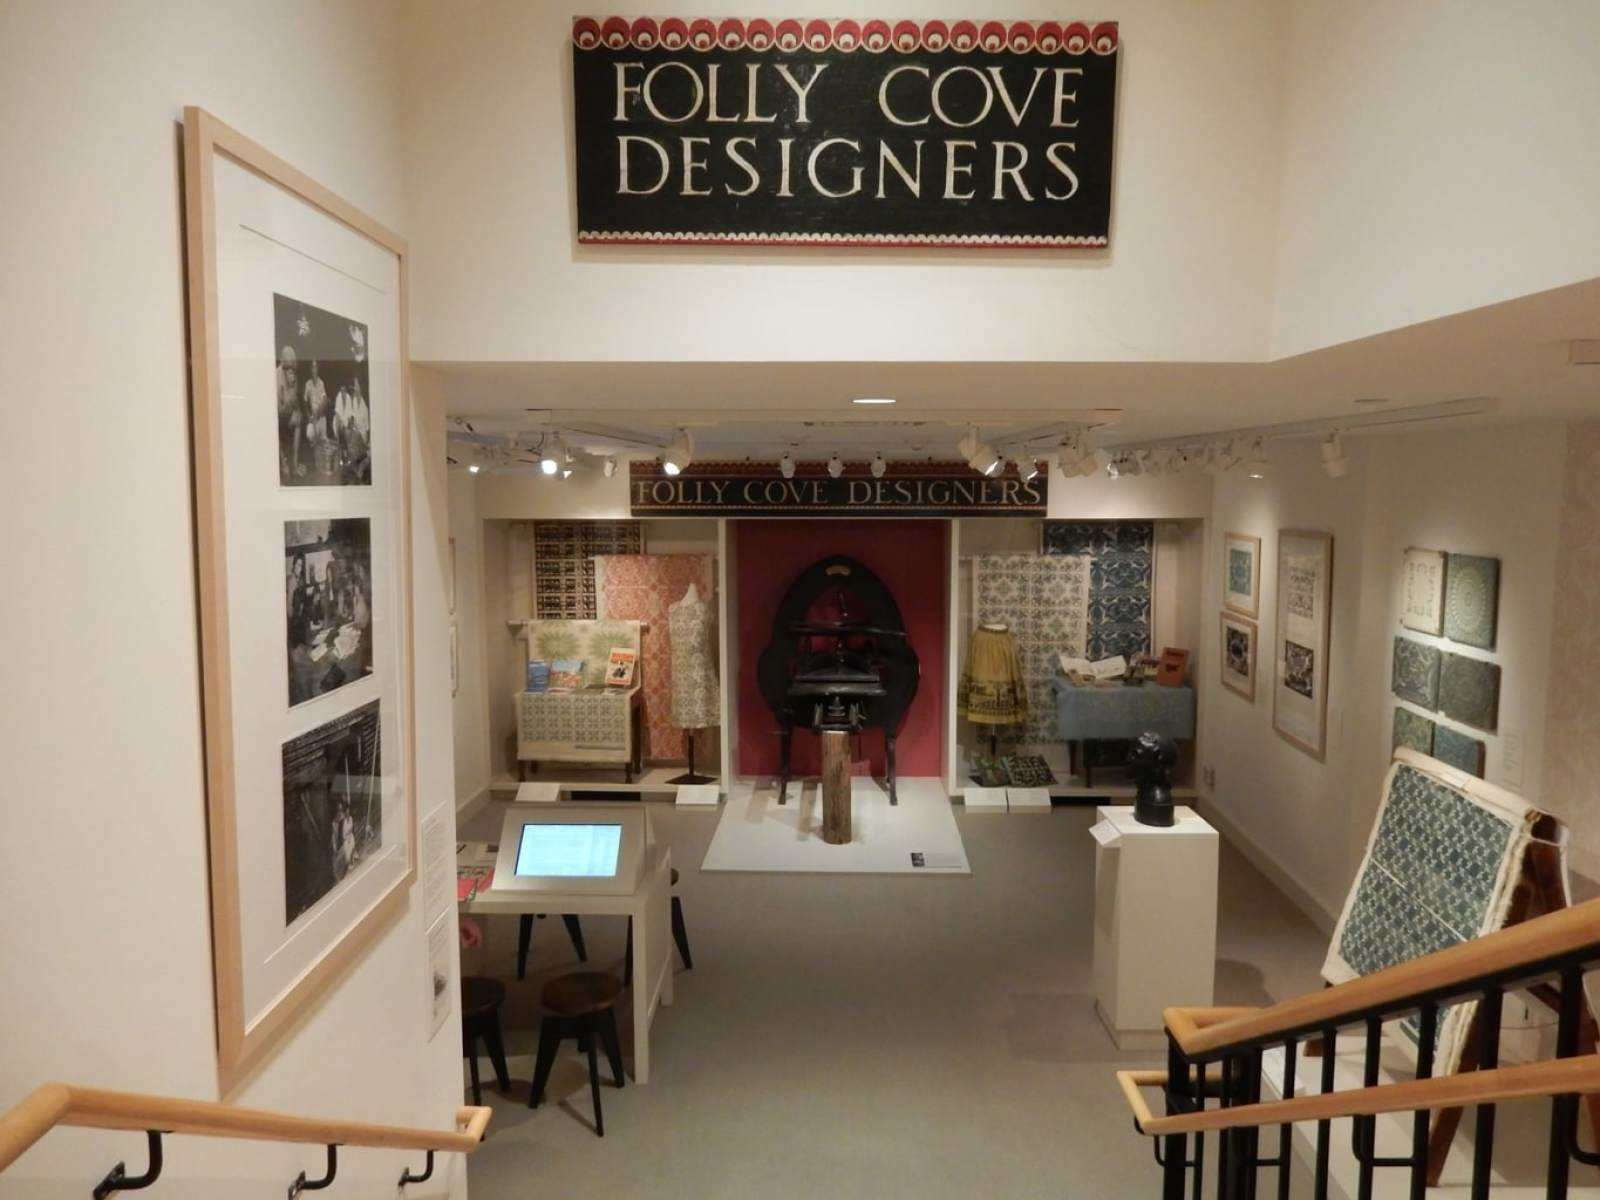 Folly Cove Designers Cape Ann Museum Gloucester MA